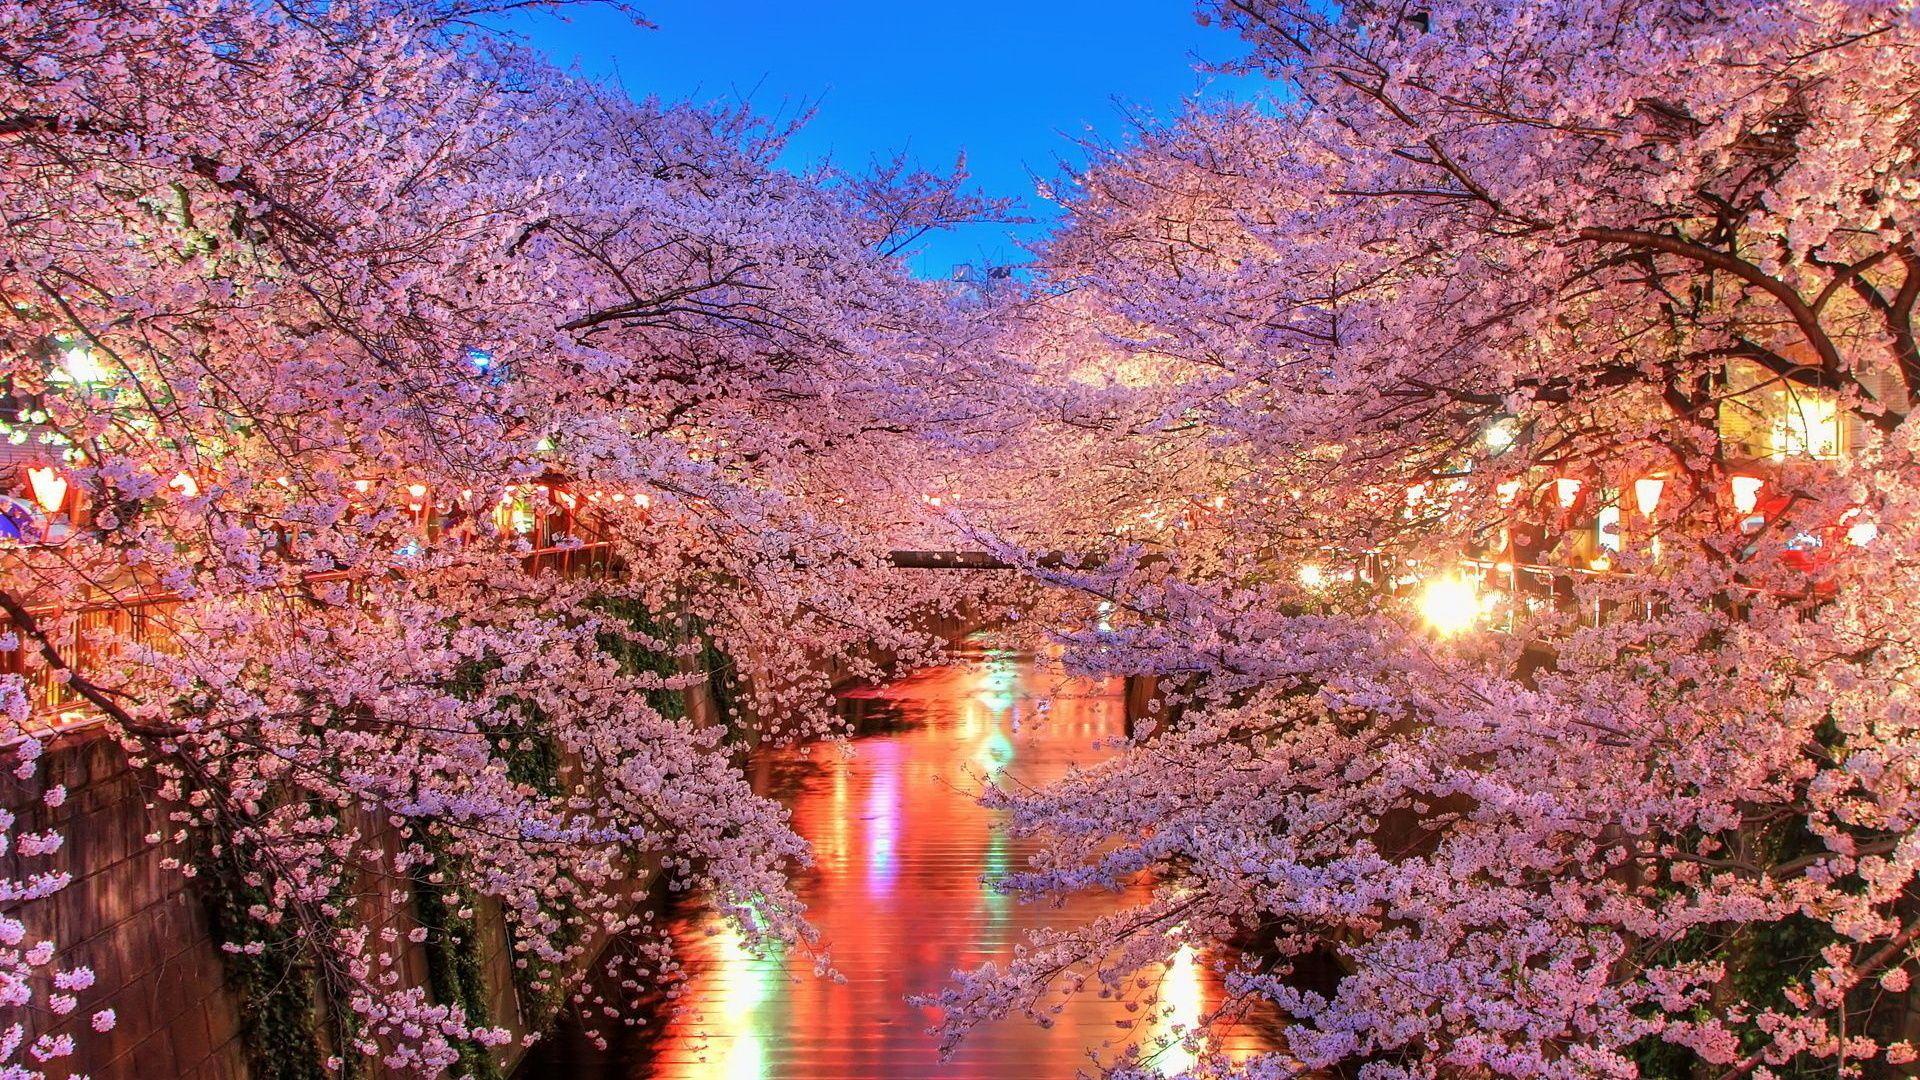 Download 1920x1080 Wallpaper Japan Cherry Blossom Tree Flowers Full Hd Hdtv Cherry Blossom Wallpaper Flower Desktop Wallpaper Aesthetic Desktop Wallpaper